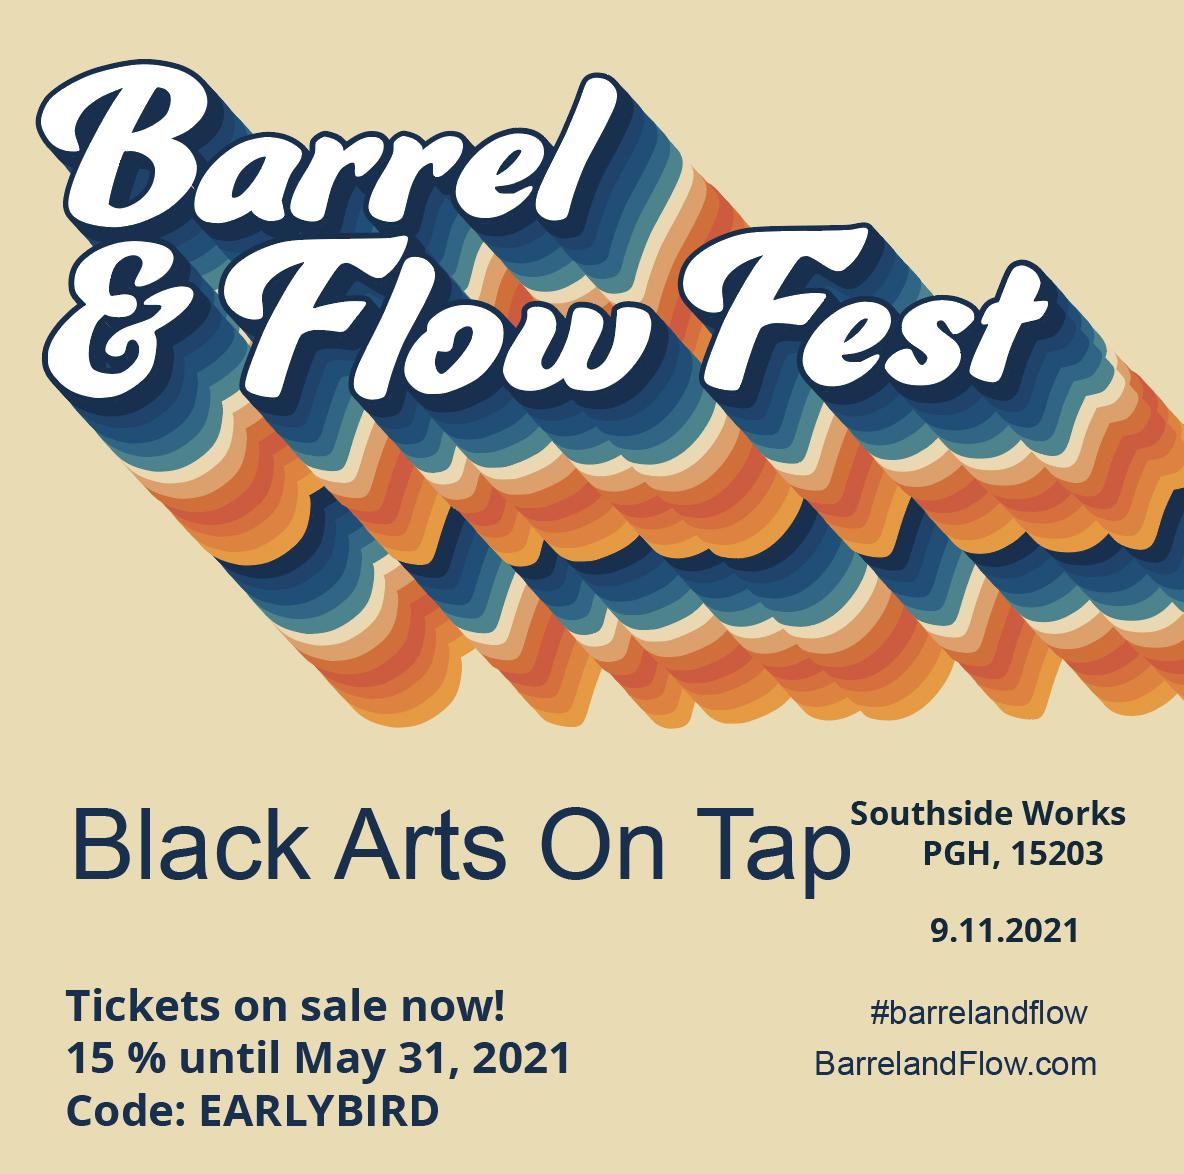 Berrel & Flow Fest 2021